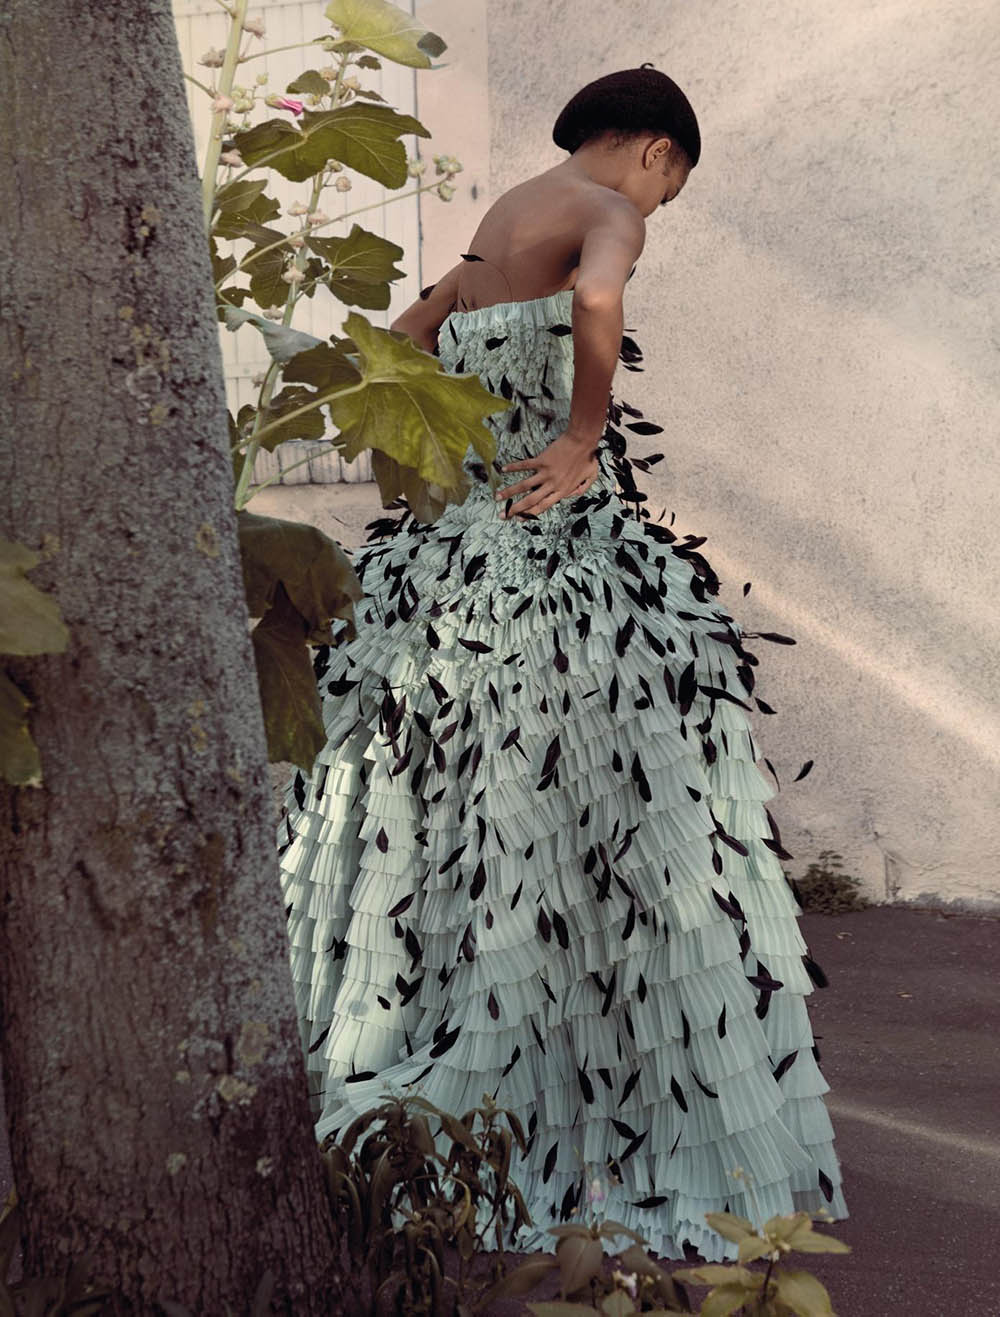 Samile Bermannelli by Katja Mayer for Numéro September 2019